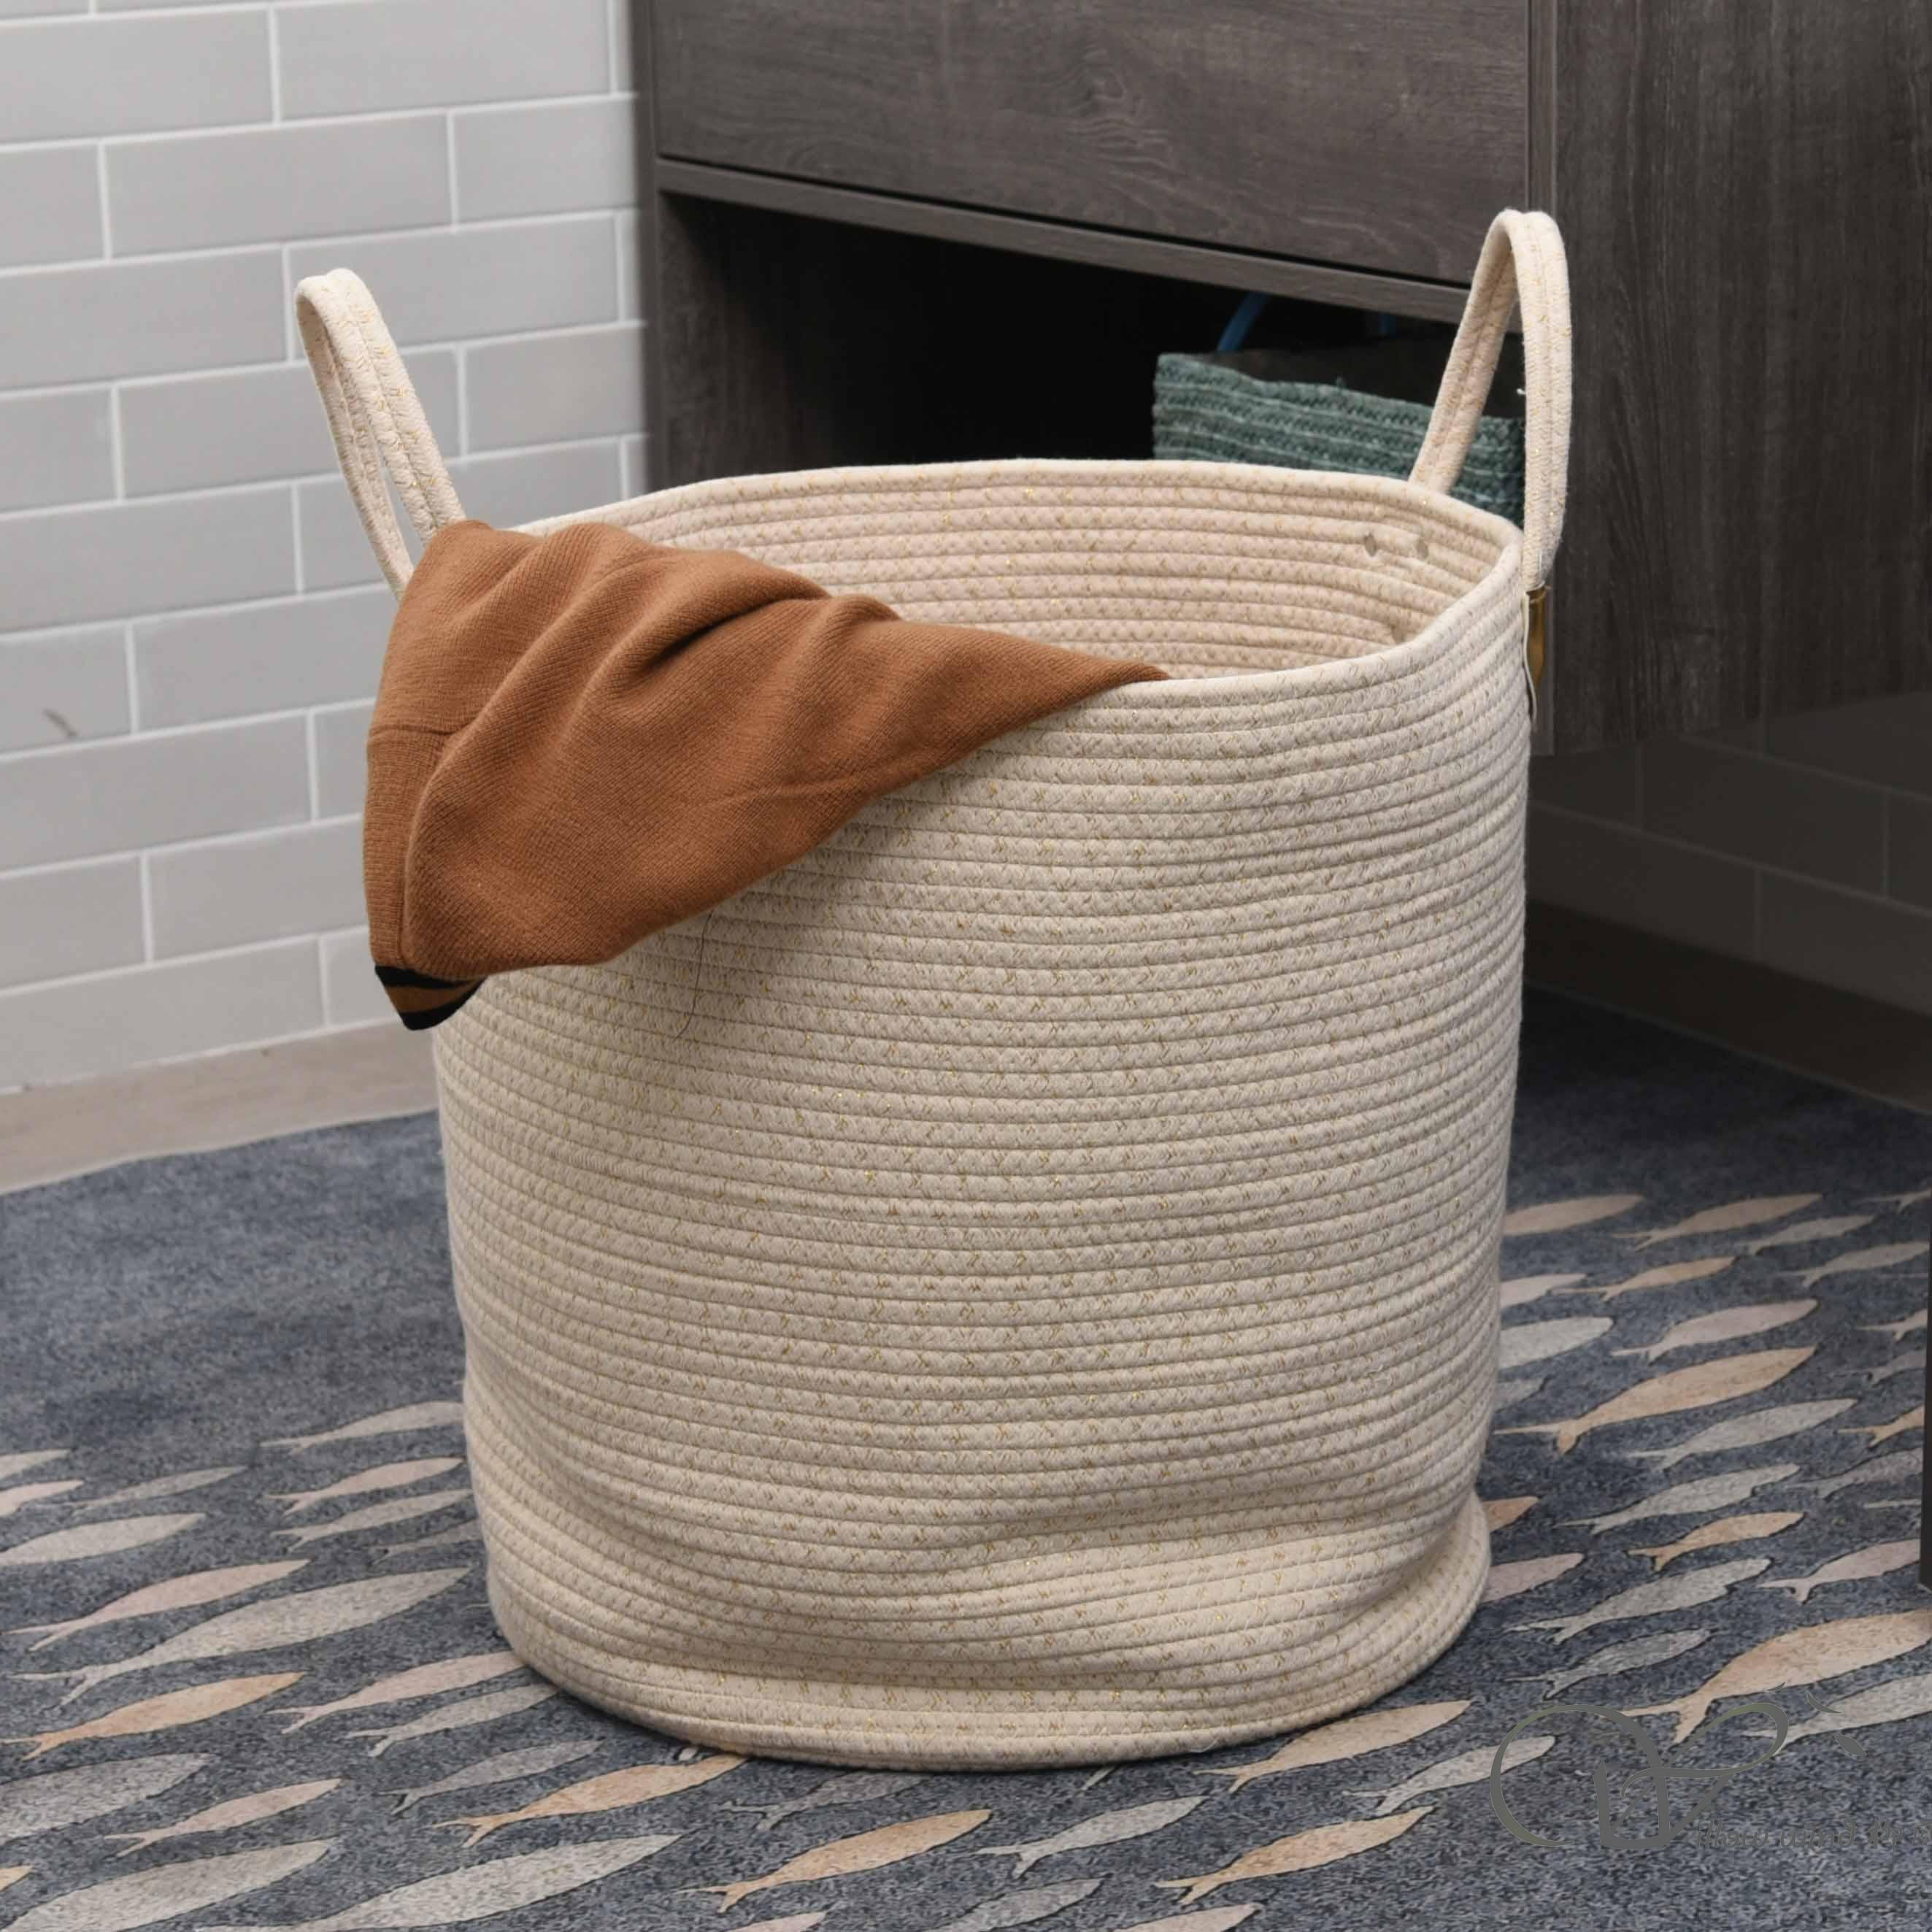 Off-white Natural cotton rope storage basket laundry basket hamper